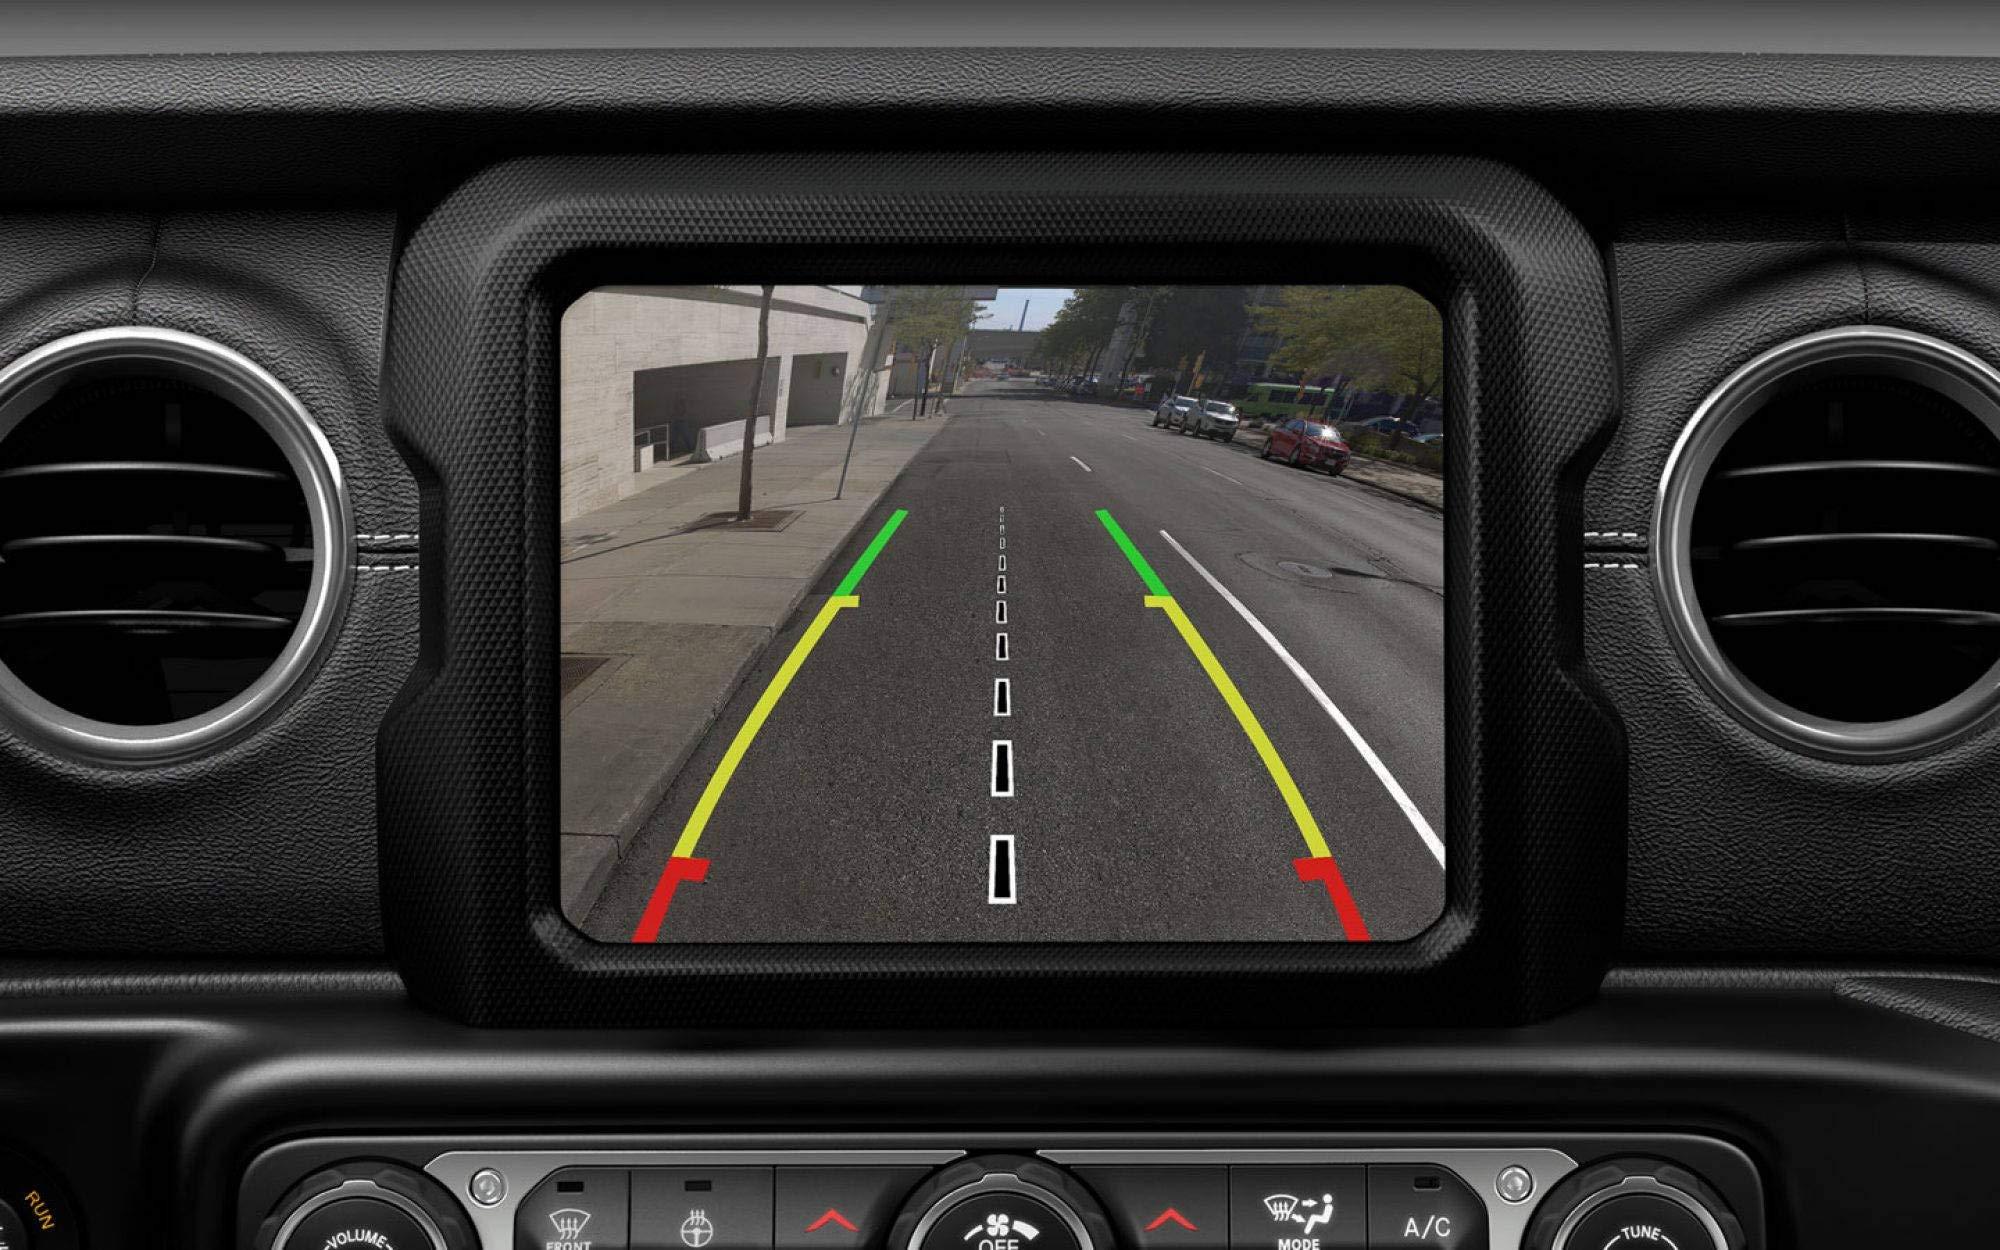 Nachtsicht-Wasserdicht-Farbkamera-170-HD-Rckfahrkamera-Kennzeichenleuchte-Einparkhilfe-Kamera-fr-Jeep-Wrangler-Sahara-Jeep-Willys-YJTJJK-J8-Wrangler-RubiconSahara-Unlimited-Sahara